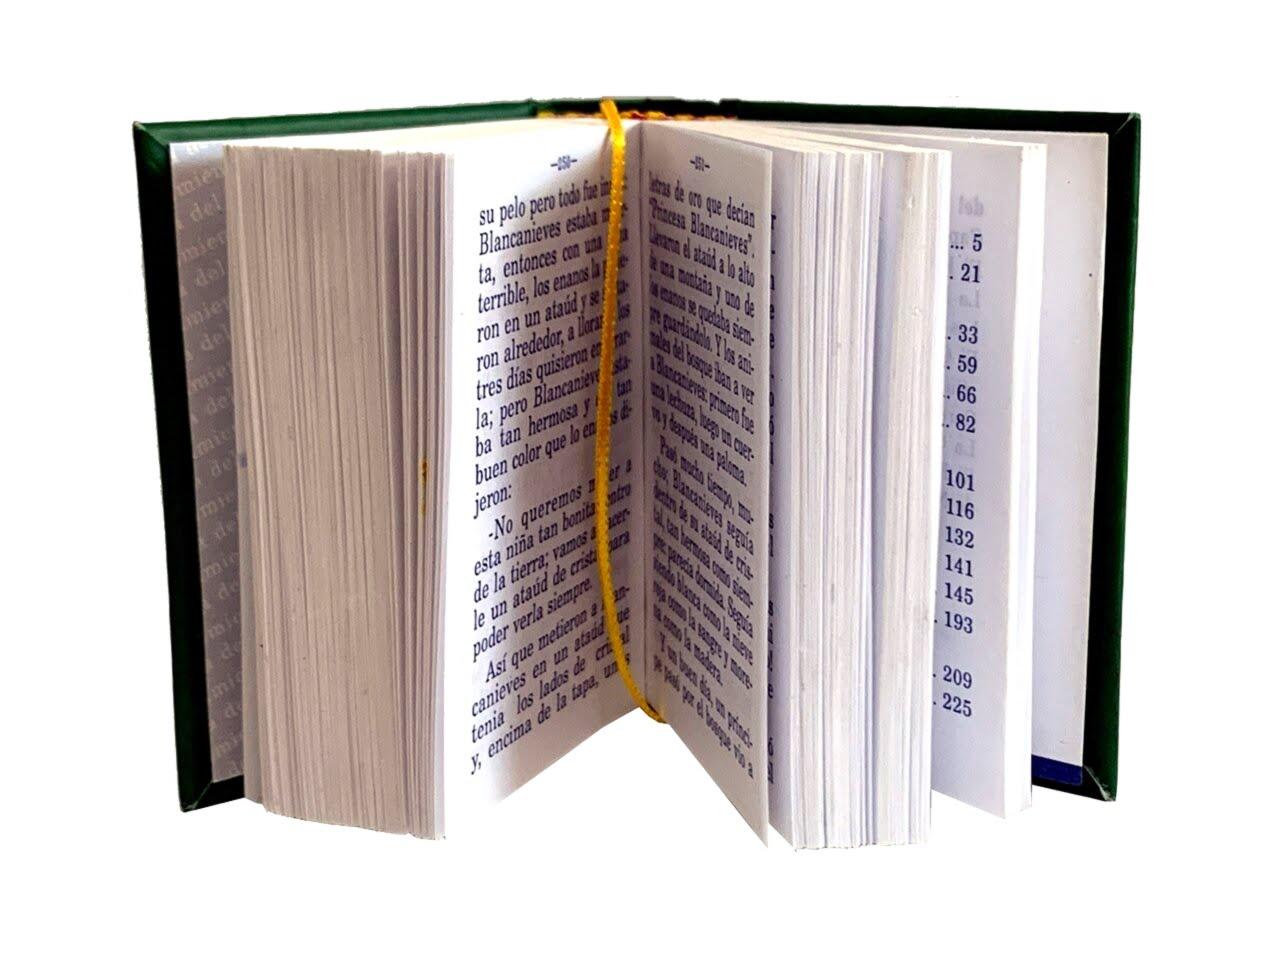 Cuentos-clasicos-II-1-miniature-book-libro